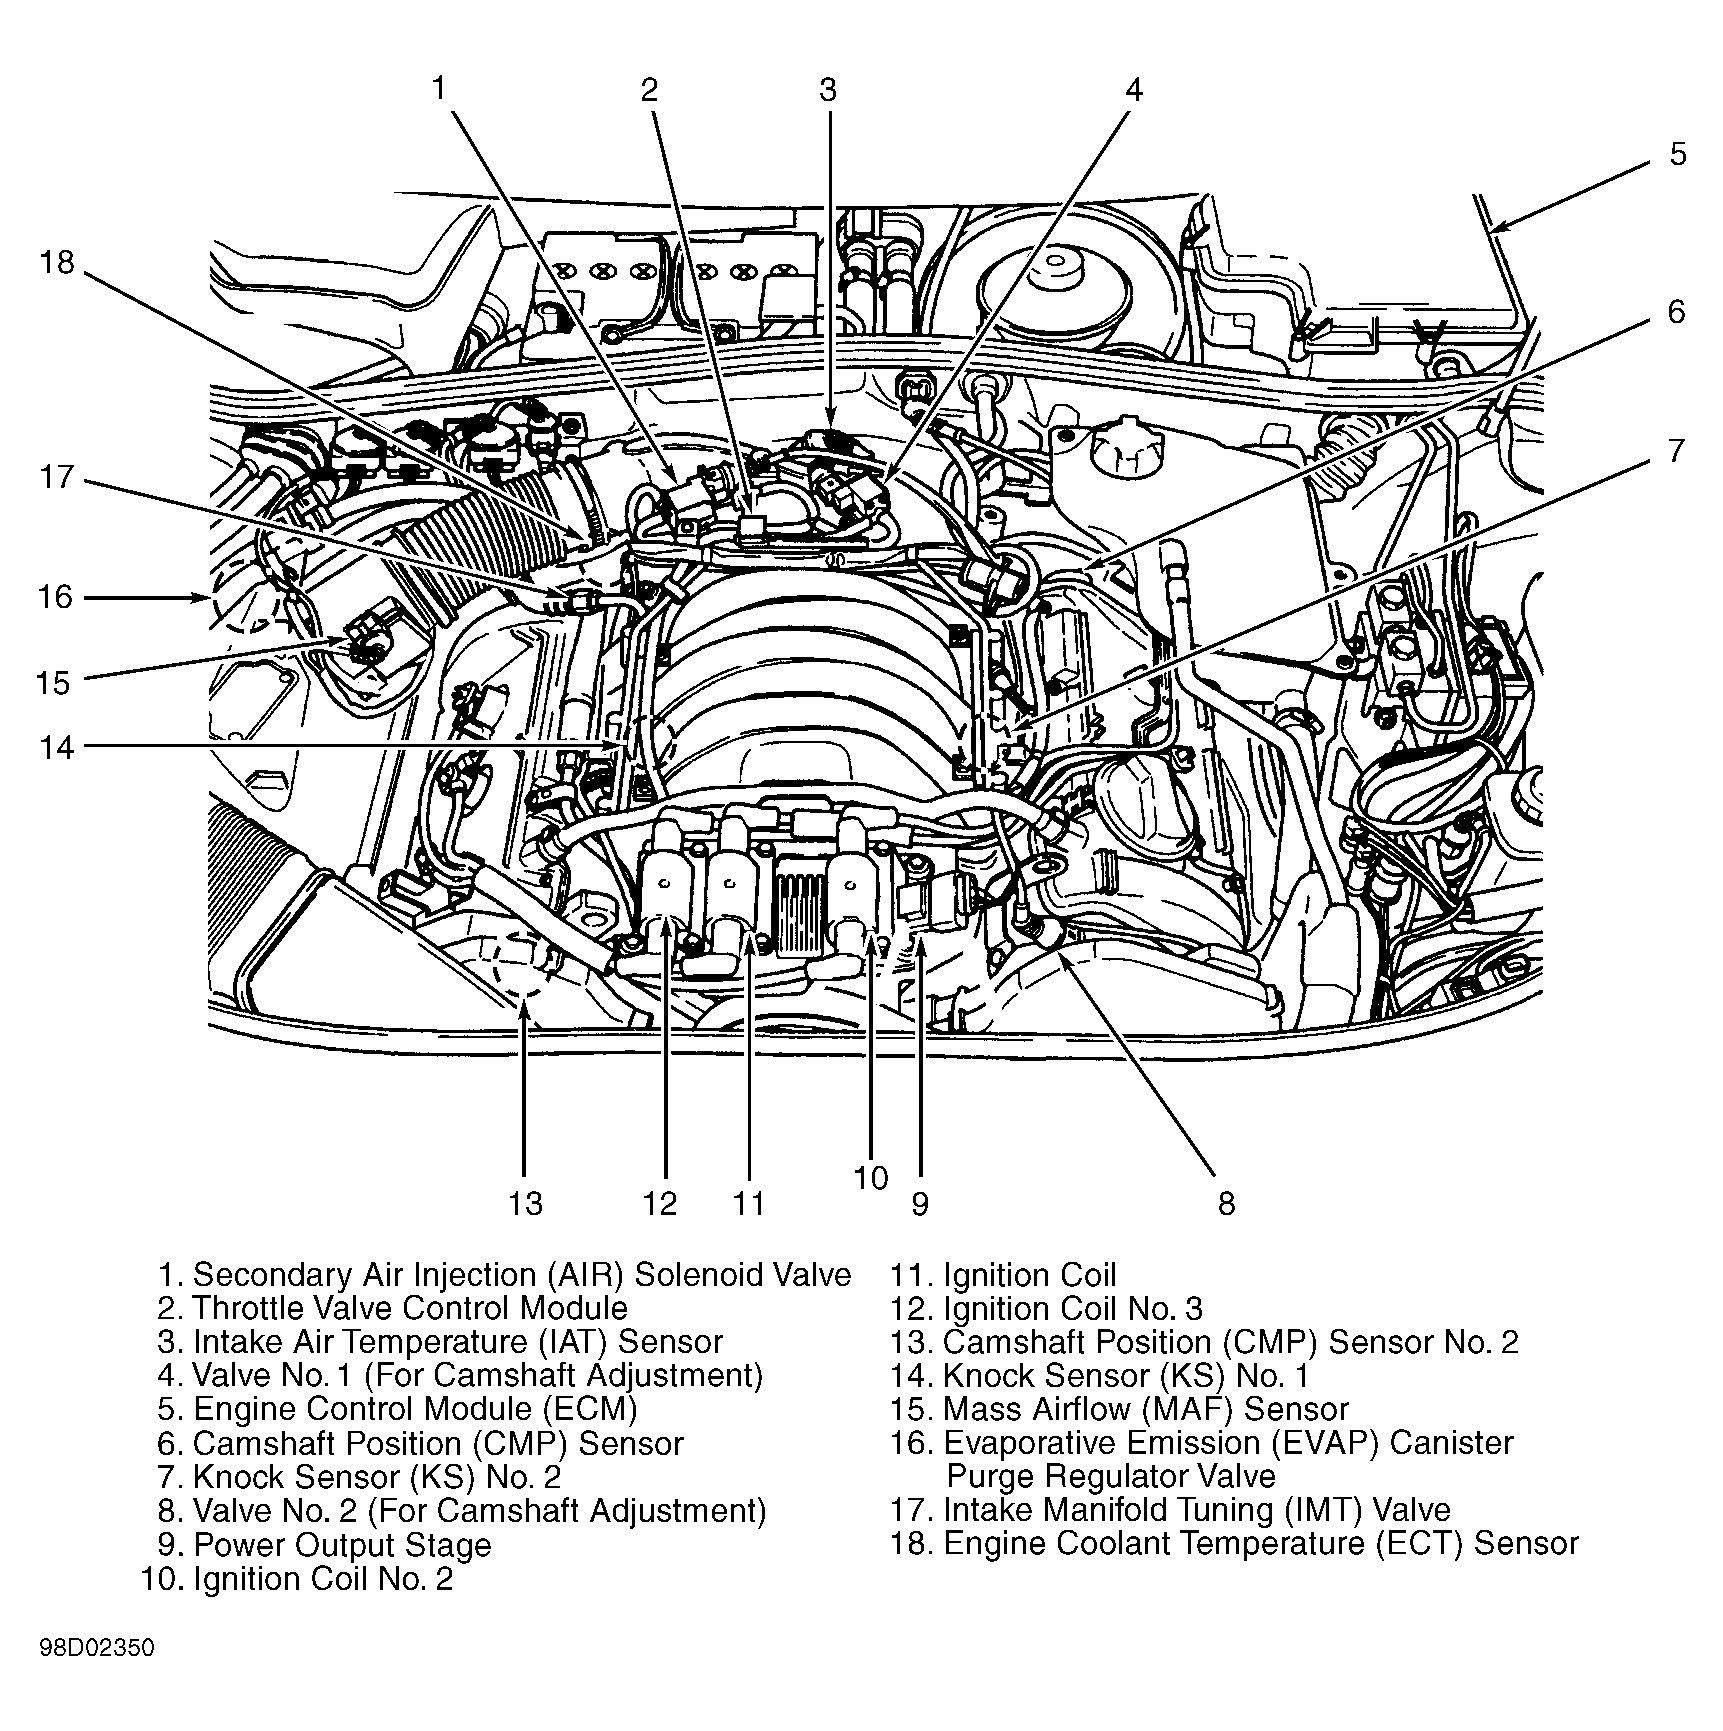 2000 Dodge Intrepid 2 7 Engine Diagram 2 In 2020 Dodge Ram 1500 Audi A4 Engineering